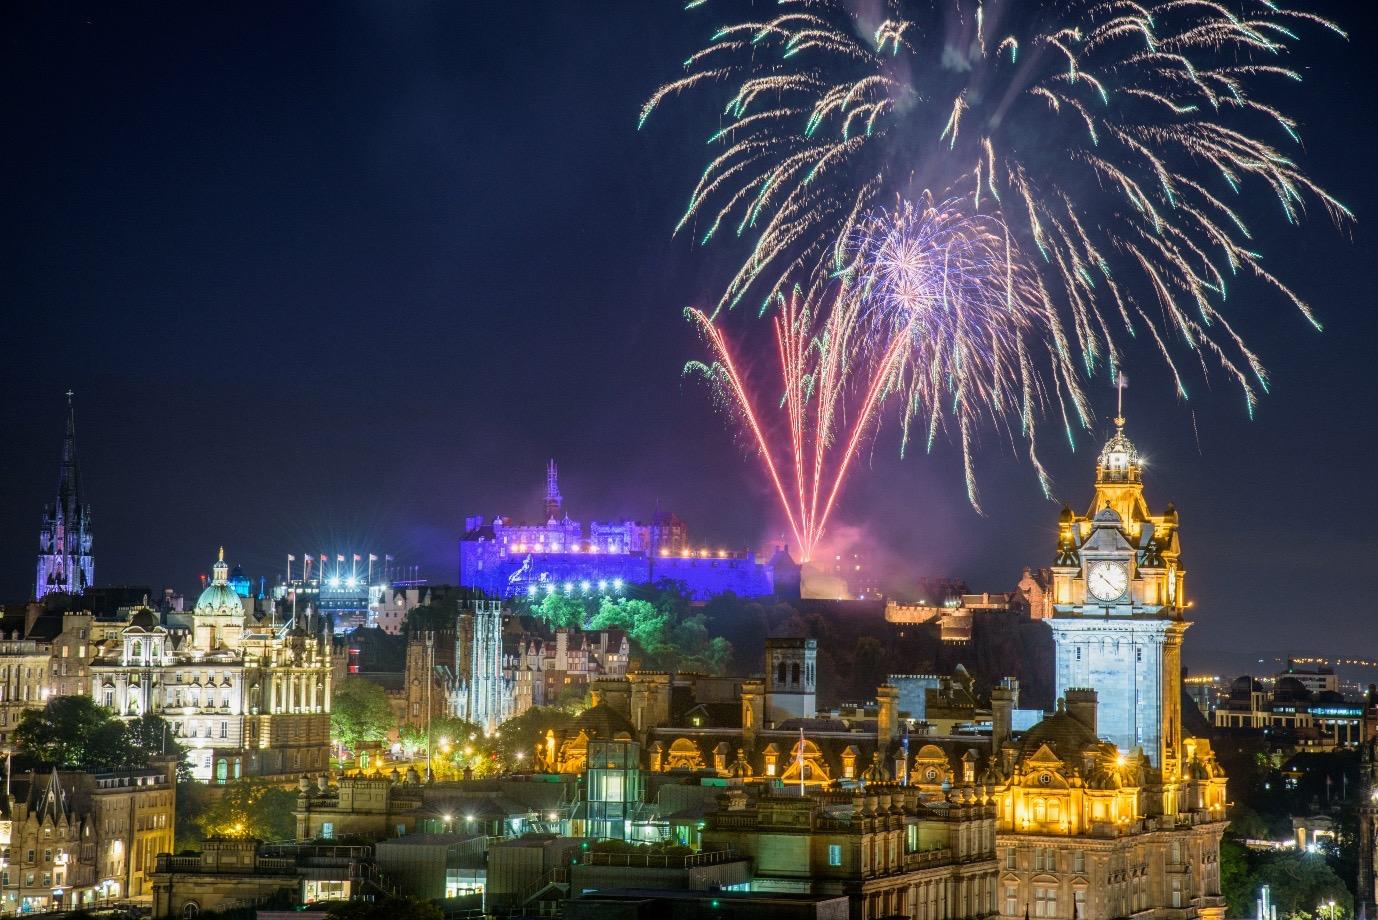 Fireworks at the Edinburgh Festival